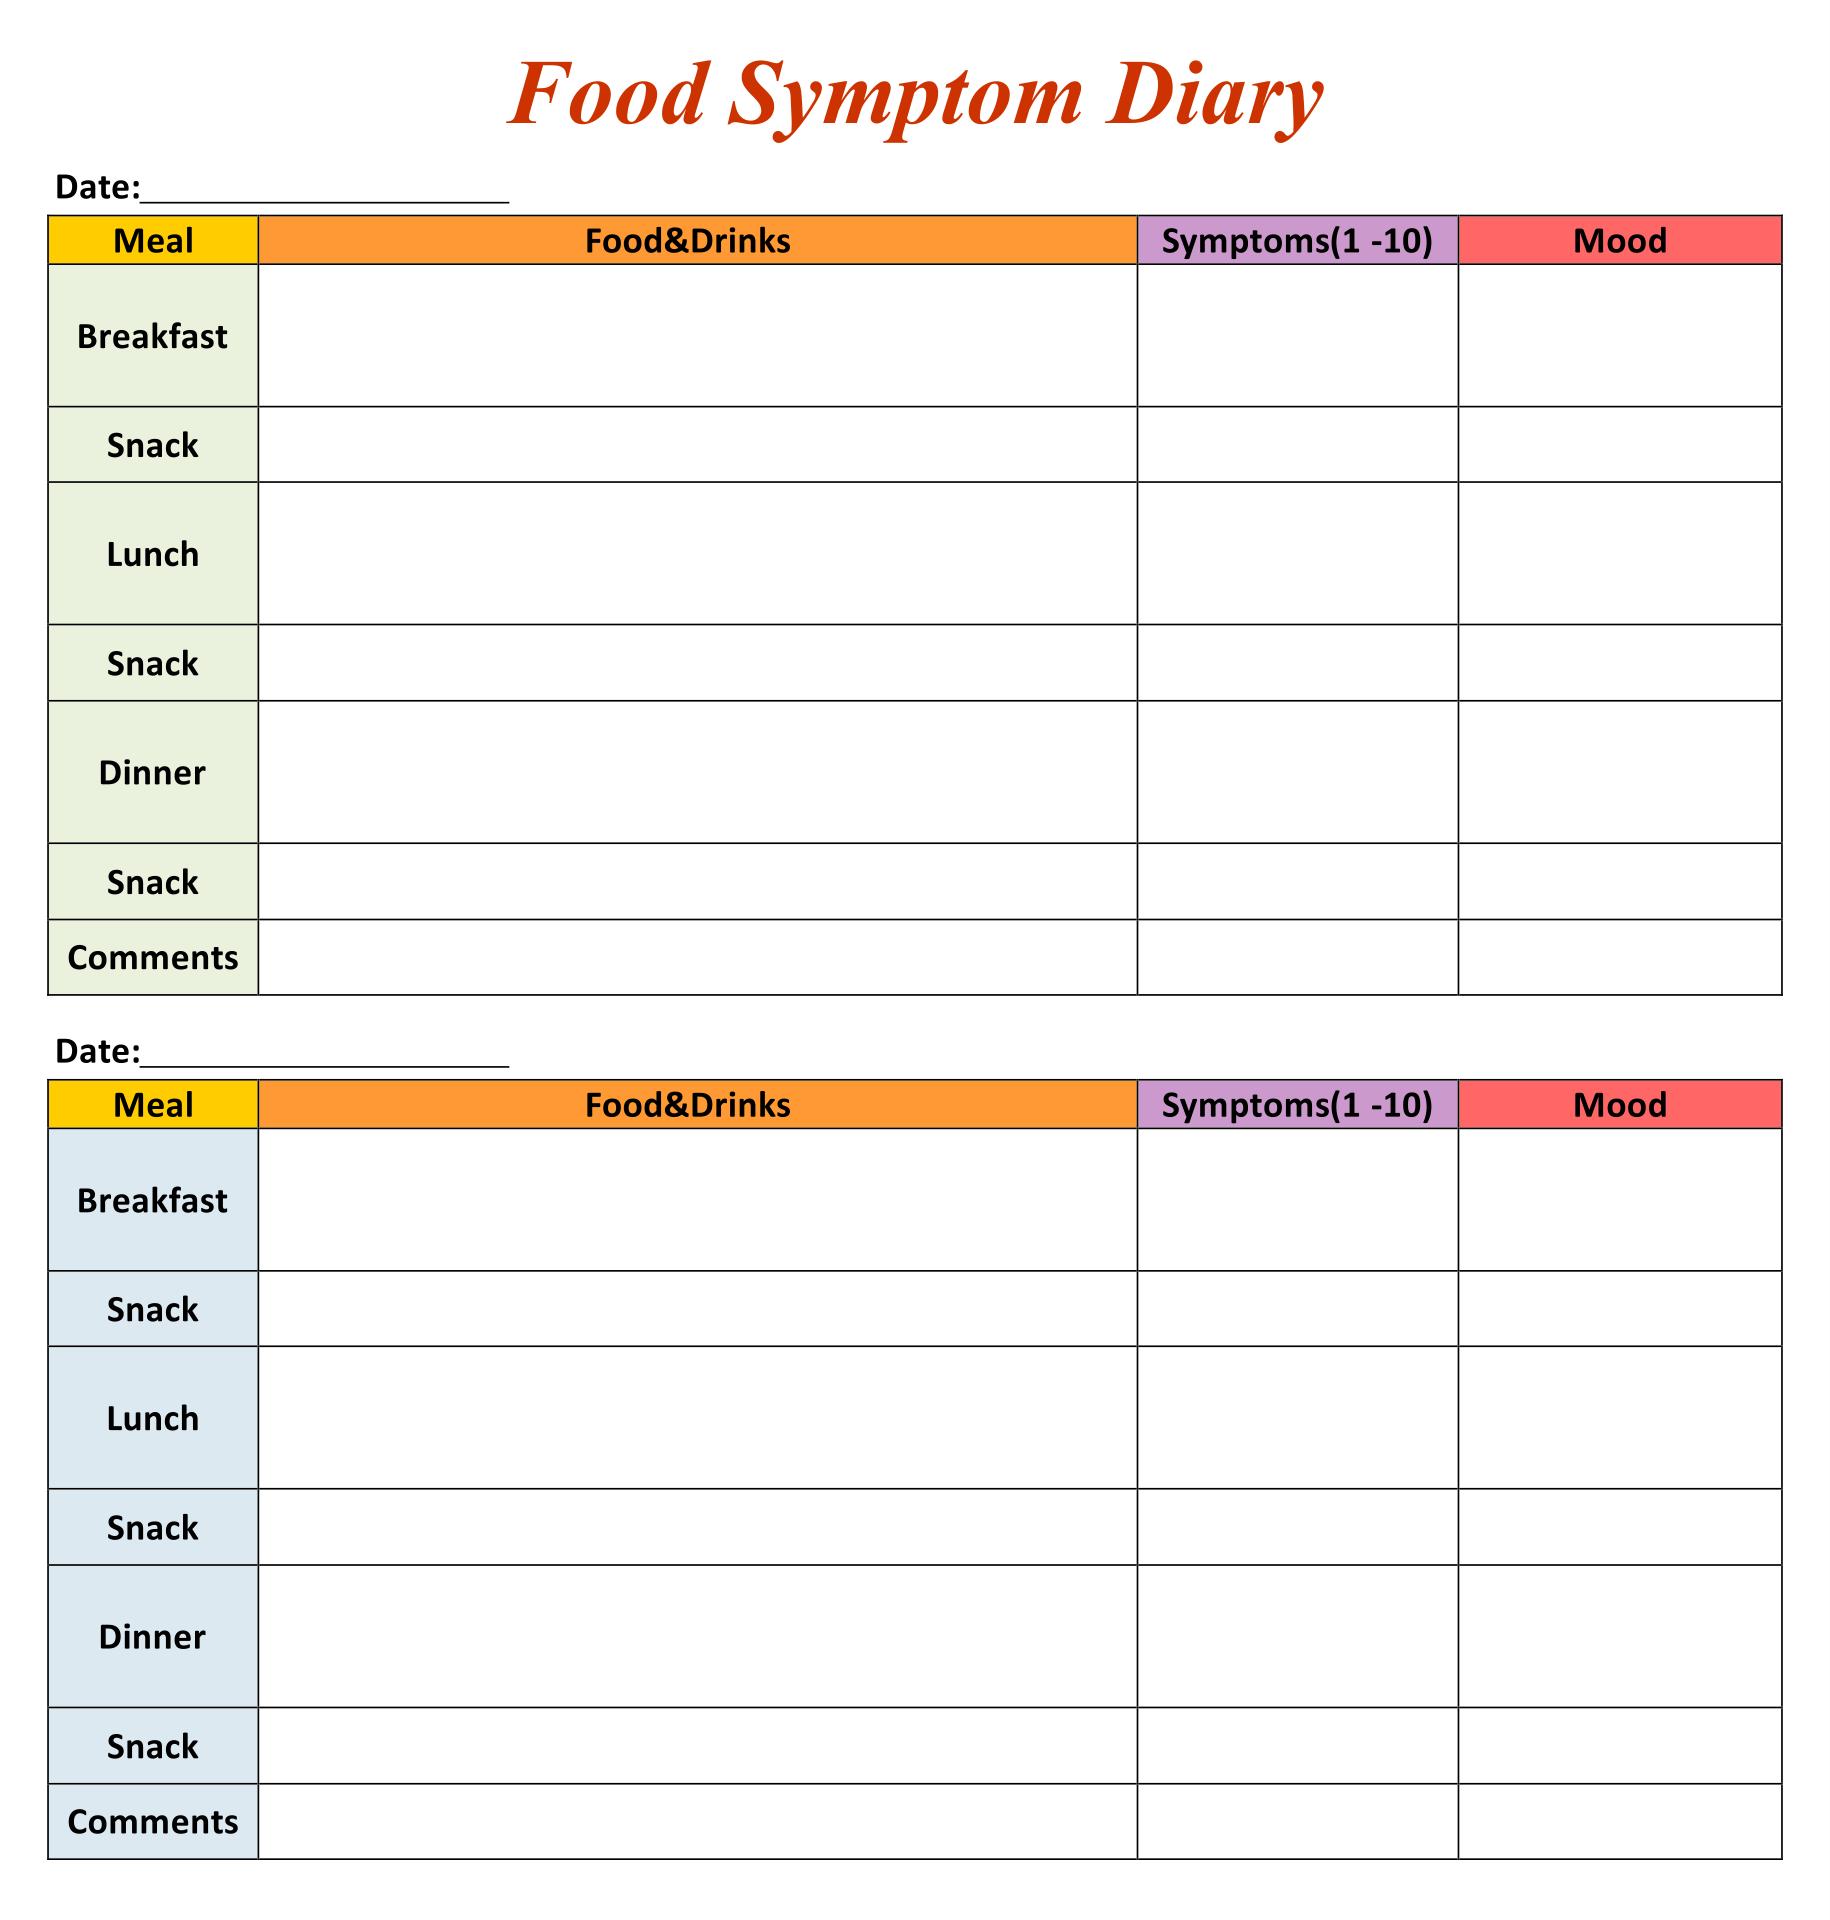 Food Symptom Diary Template